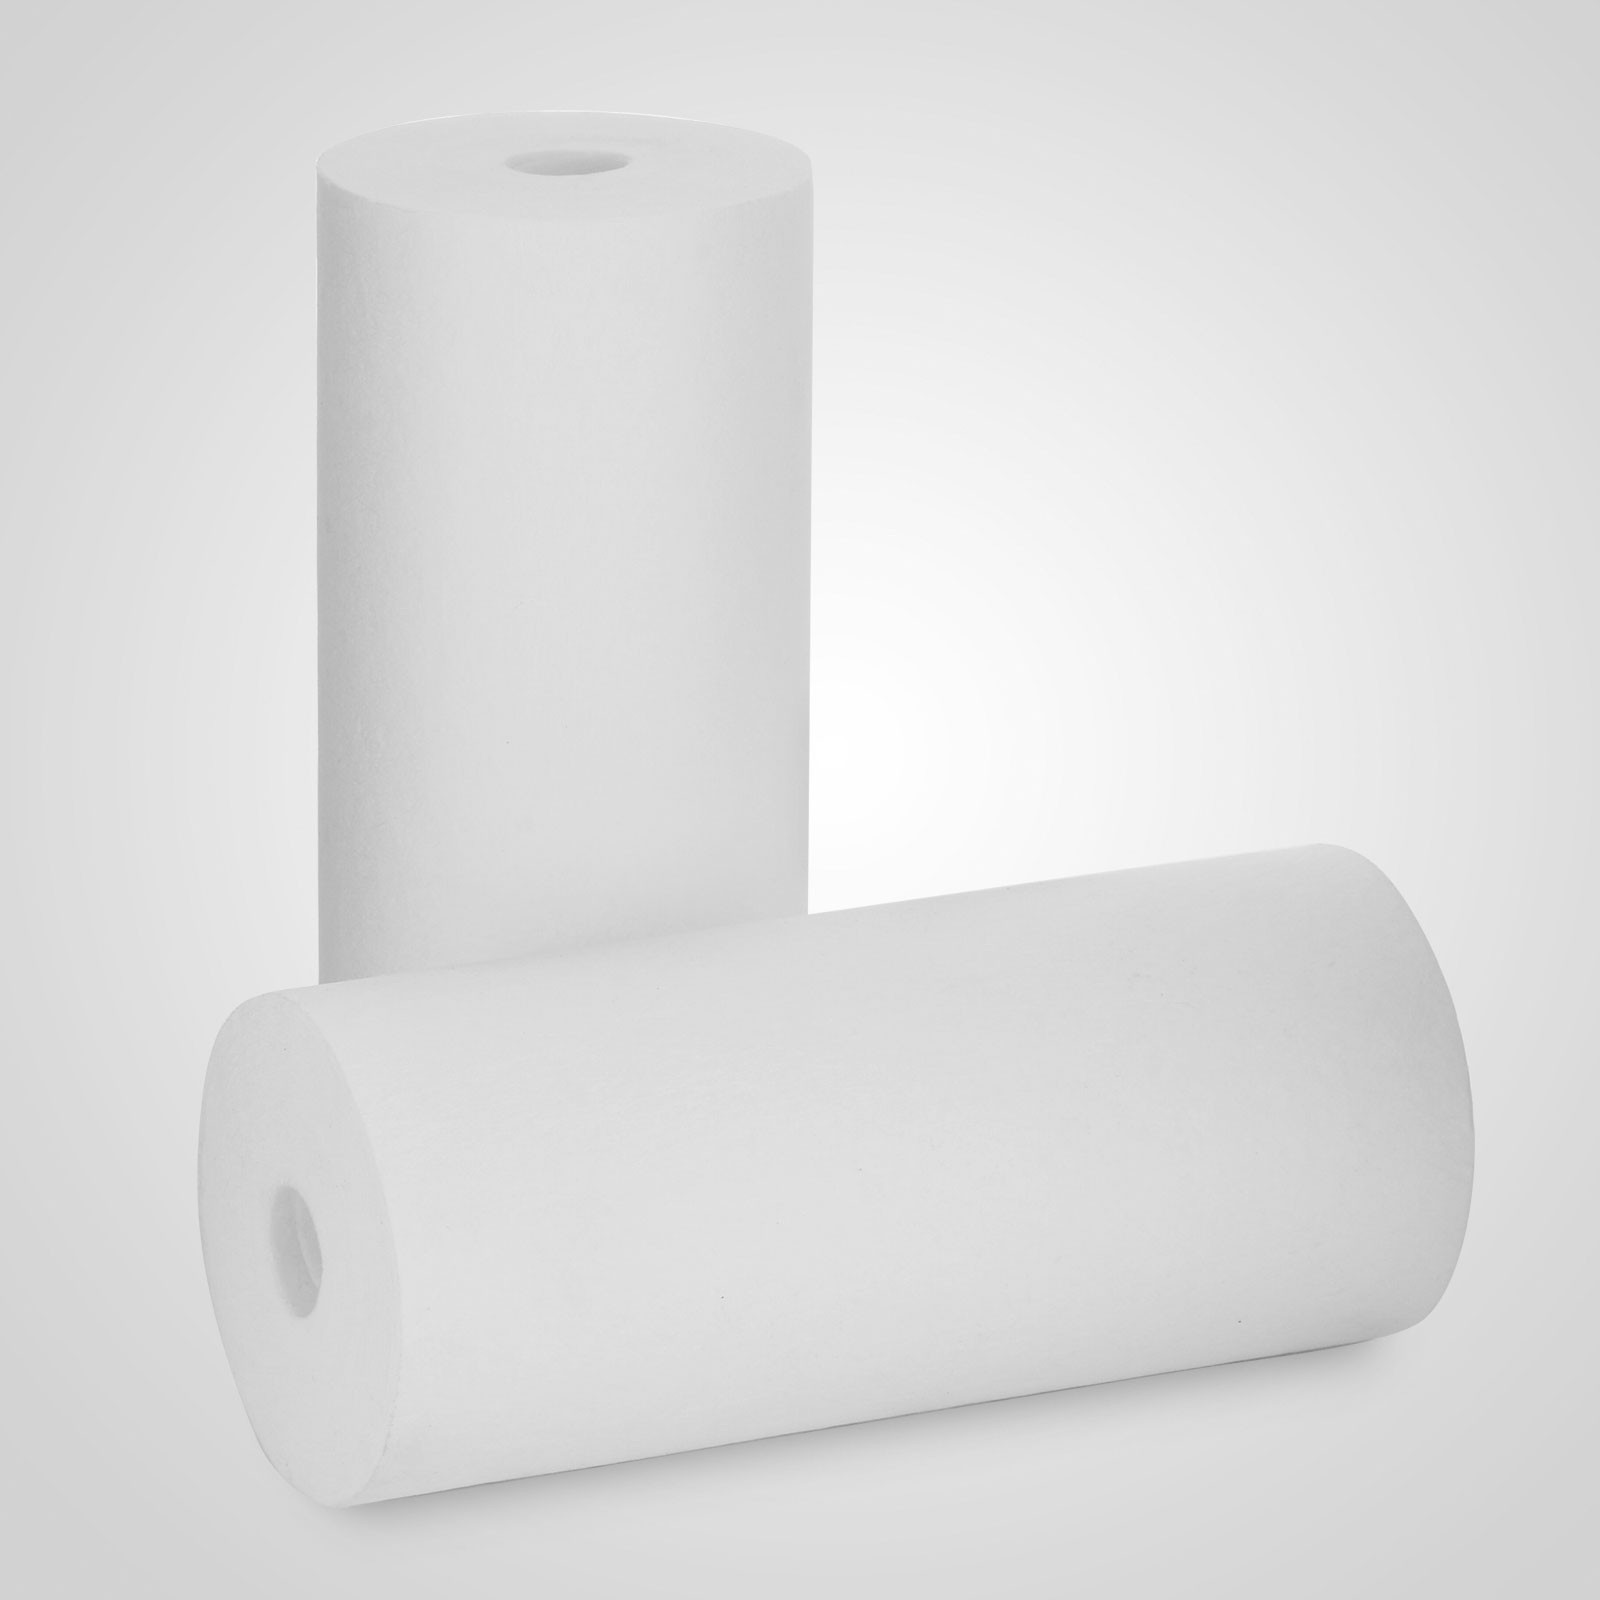 20Pcs-Cartouche-Filtre-a-eau-5-Micron-10-034-X-4-5-034-as-Brita-Bobine-Anti-boue miniature 9